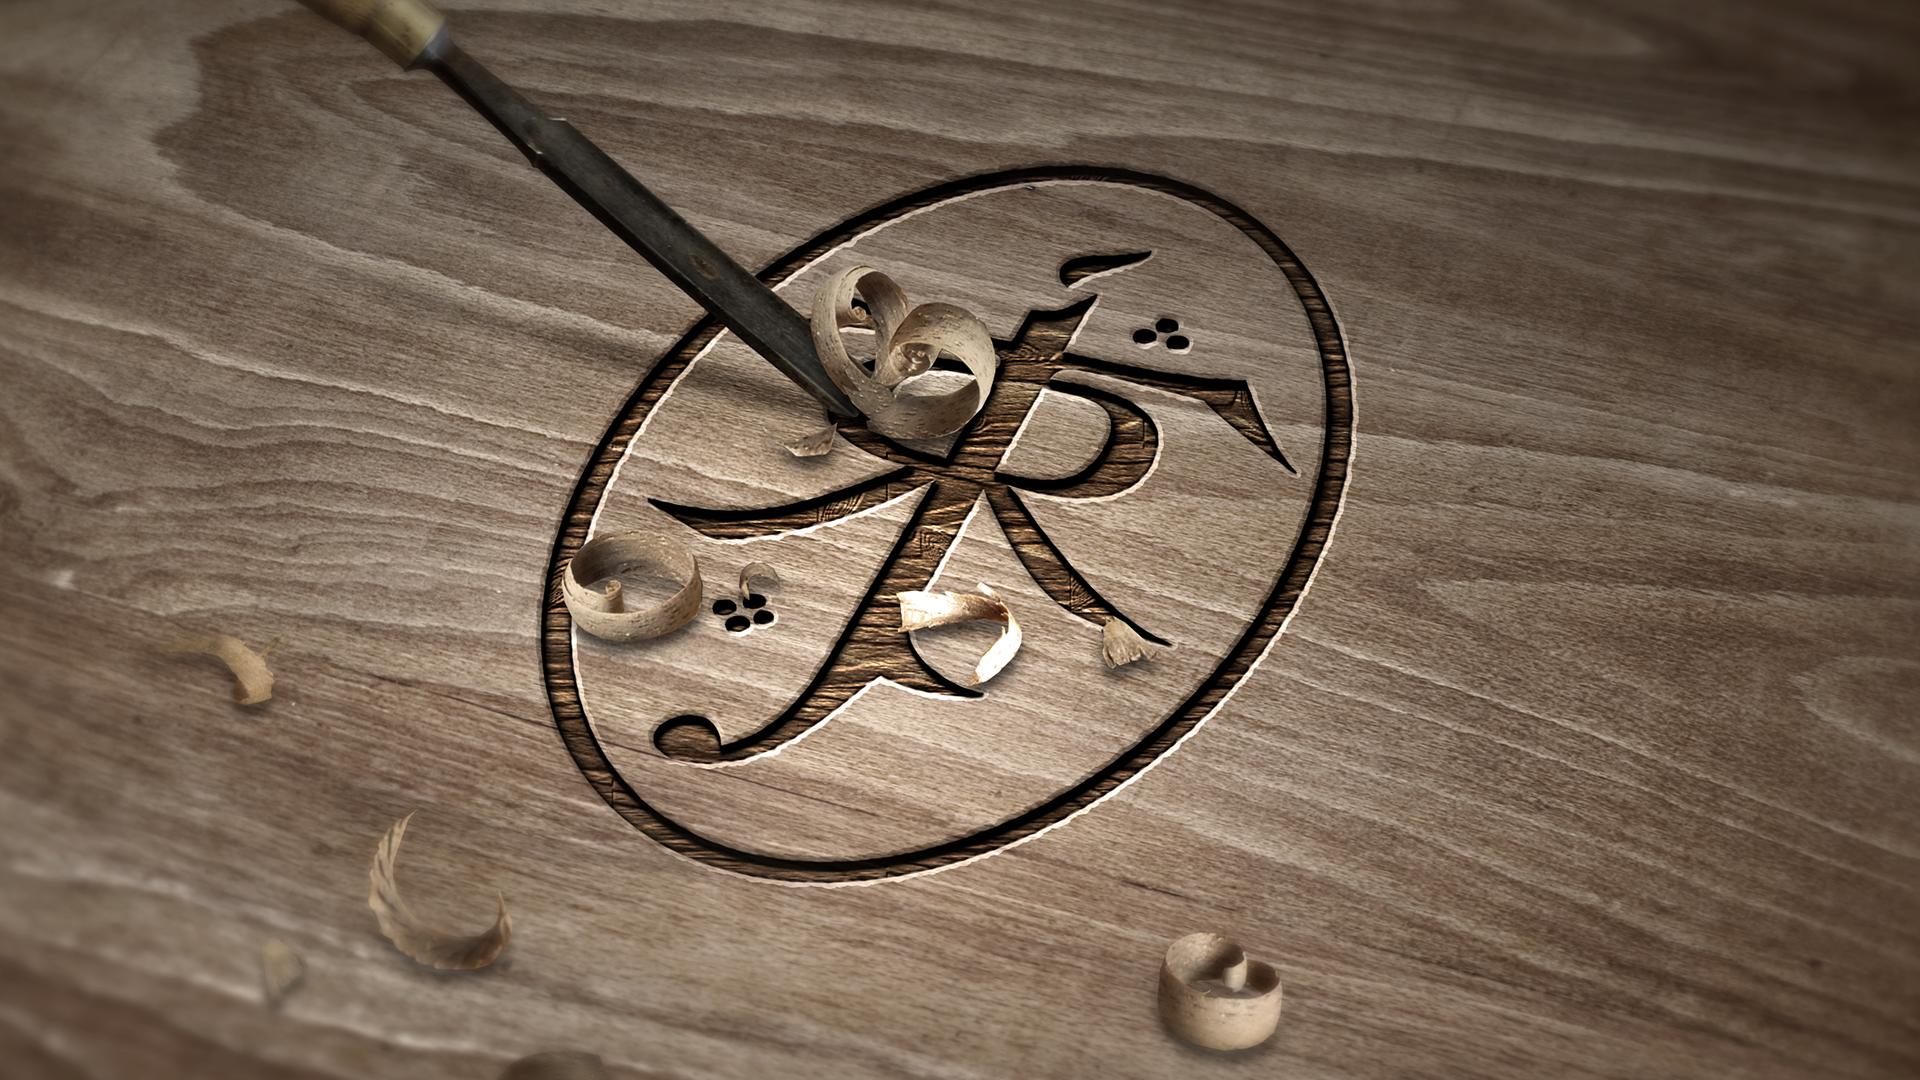 http://orig11.deviantart.net/47e9/f/2014/223/e/7/j_r_r__tolkien_symbol___carved_wood_by_dapence-d7ut0b0.png